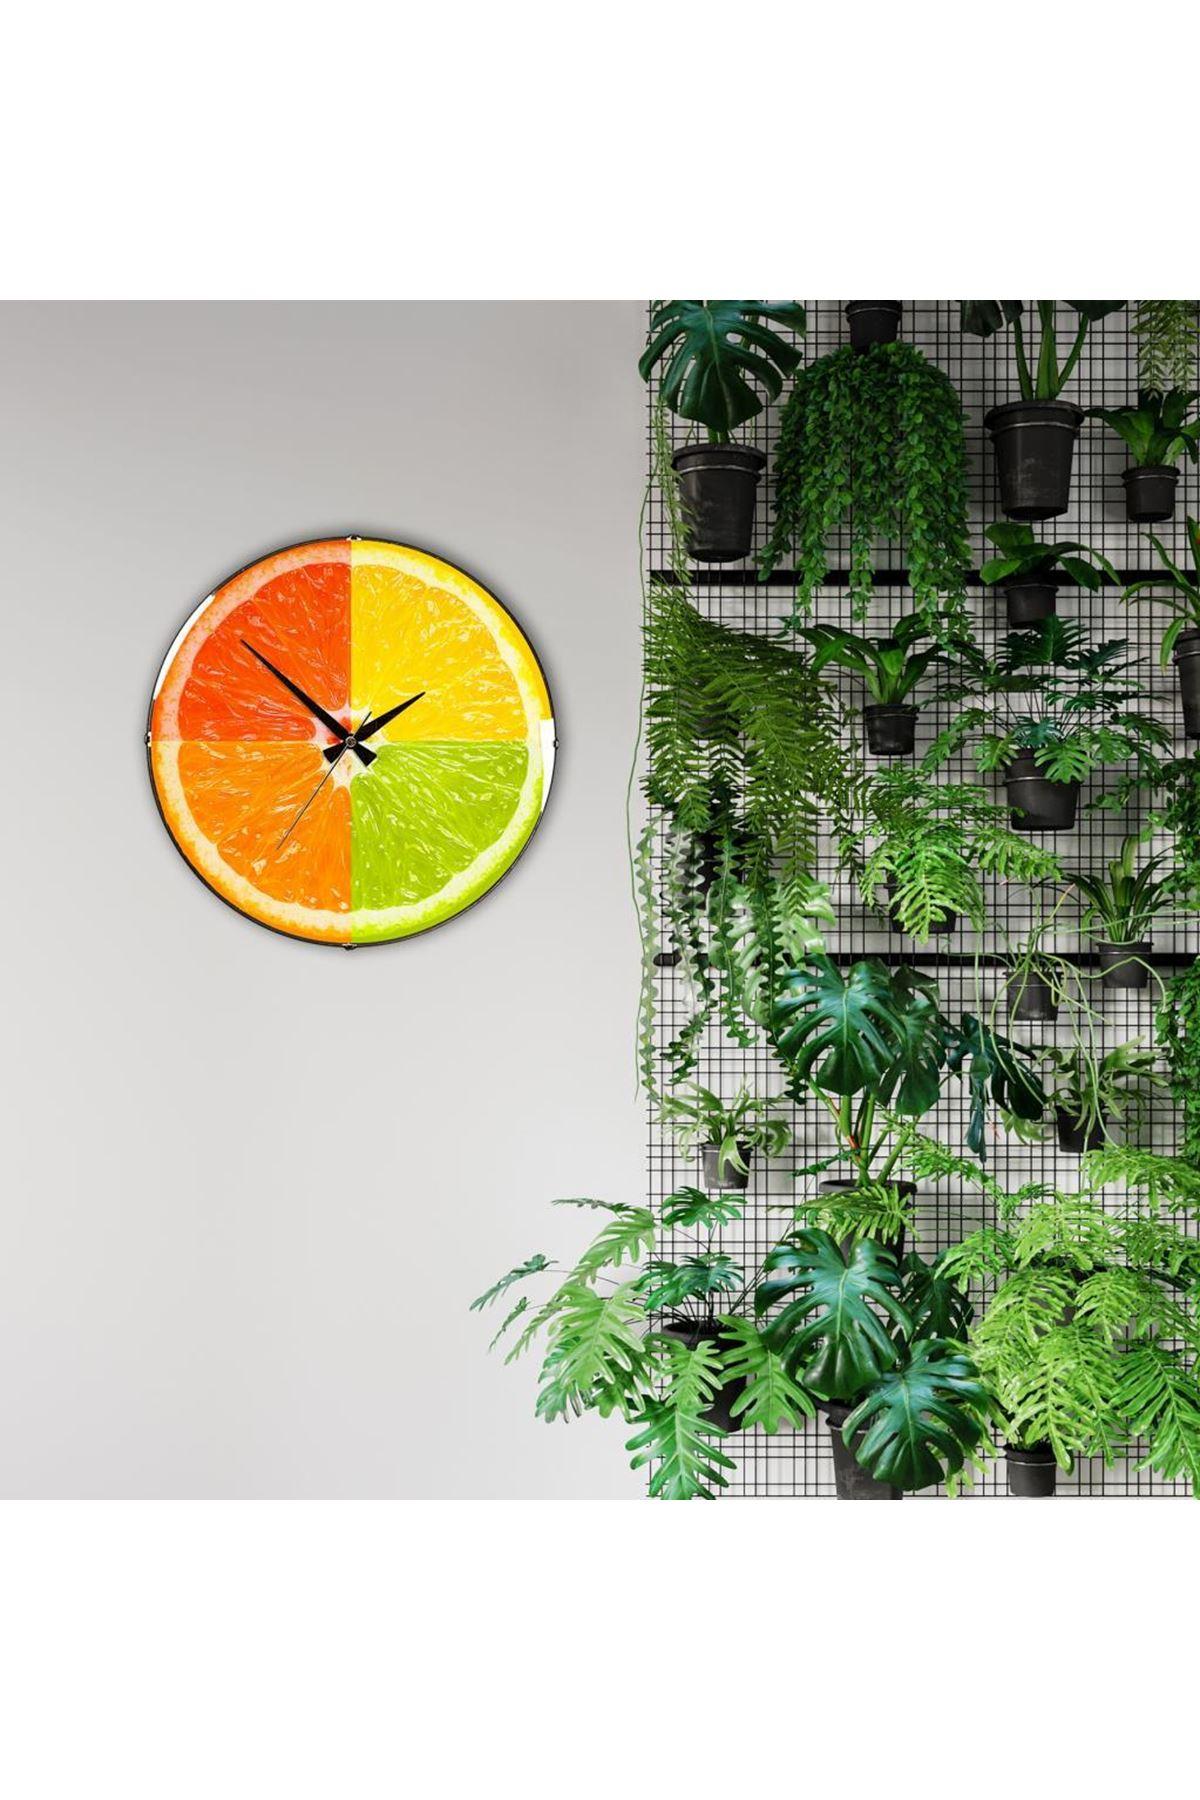 Rikon Renkli Portakal Dekoratif Bombe Camlı Duvar Saati